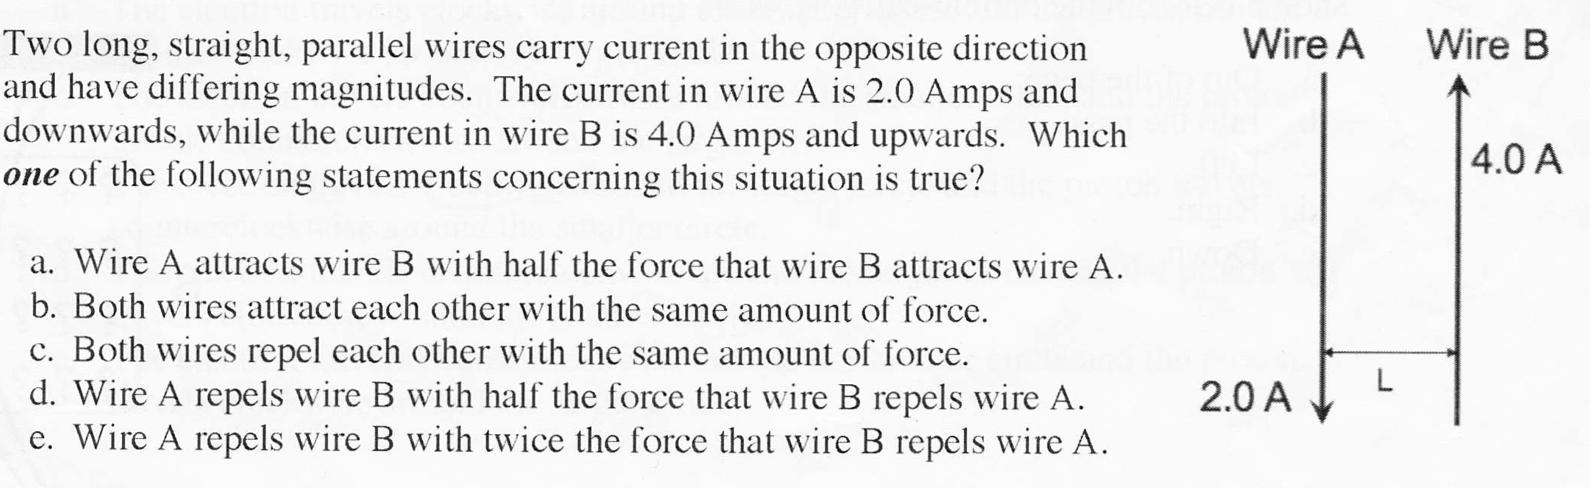 Physics 247 homework help friction weight